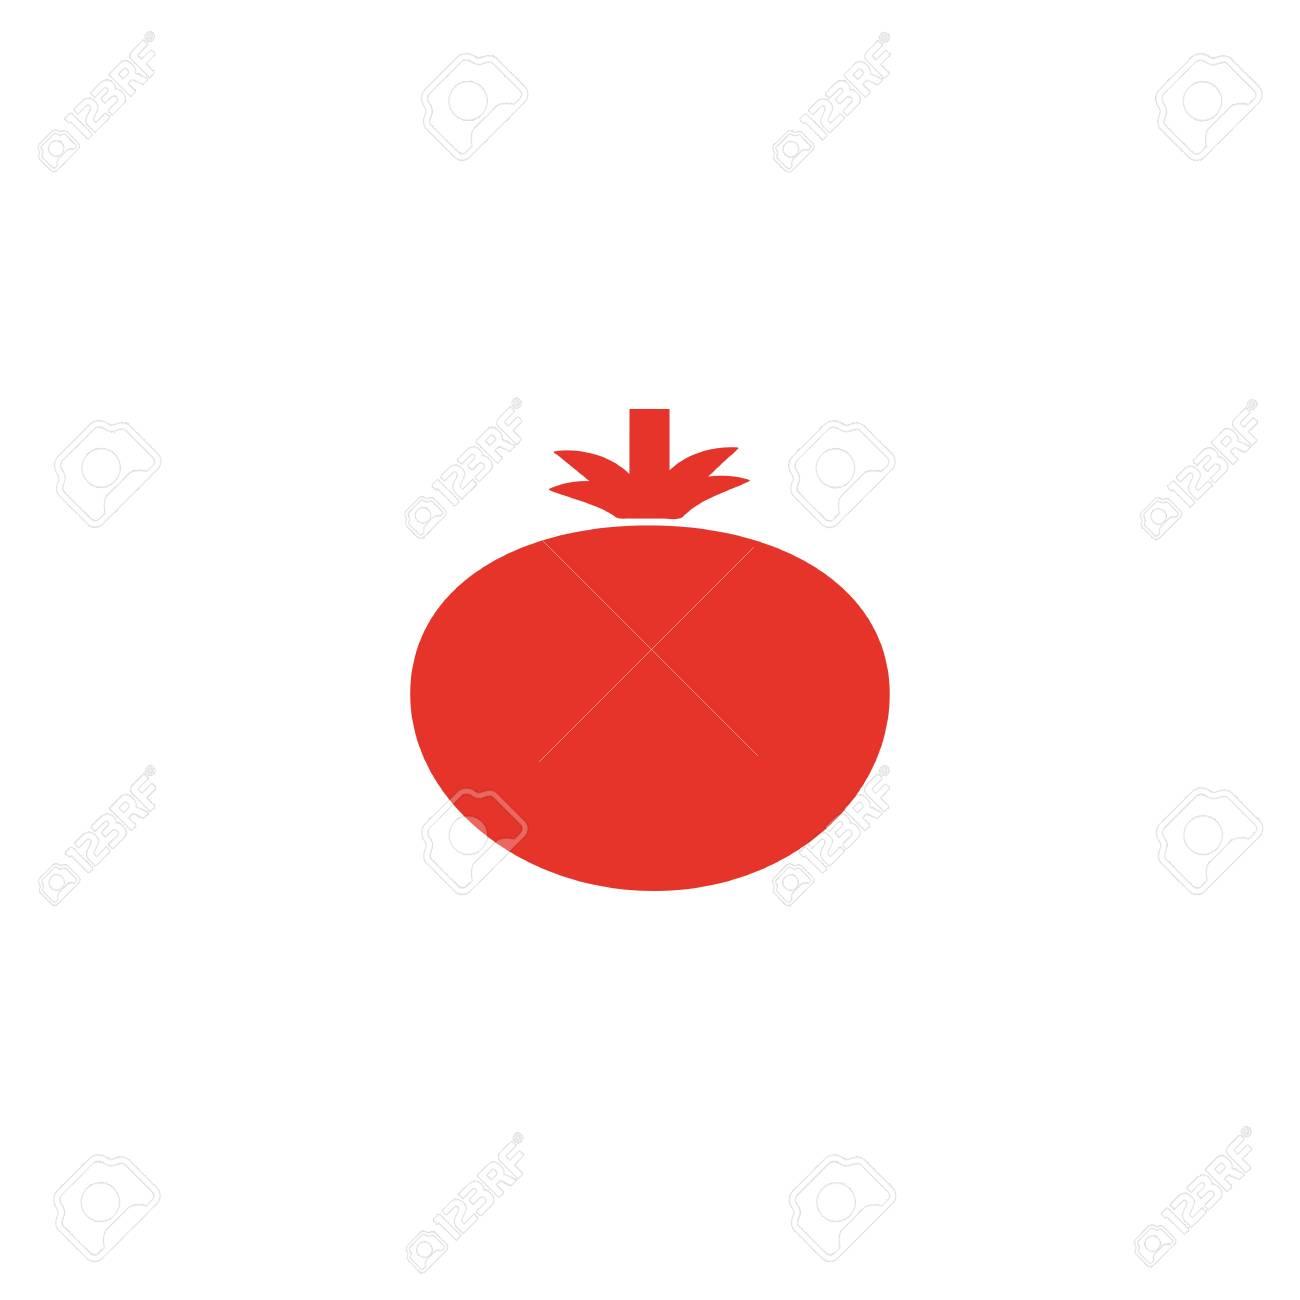 tomato icons Stock Vector - 17259014